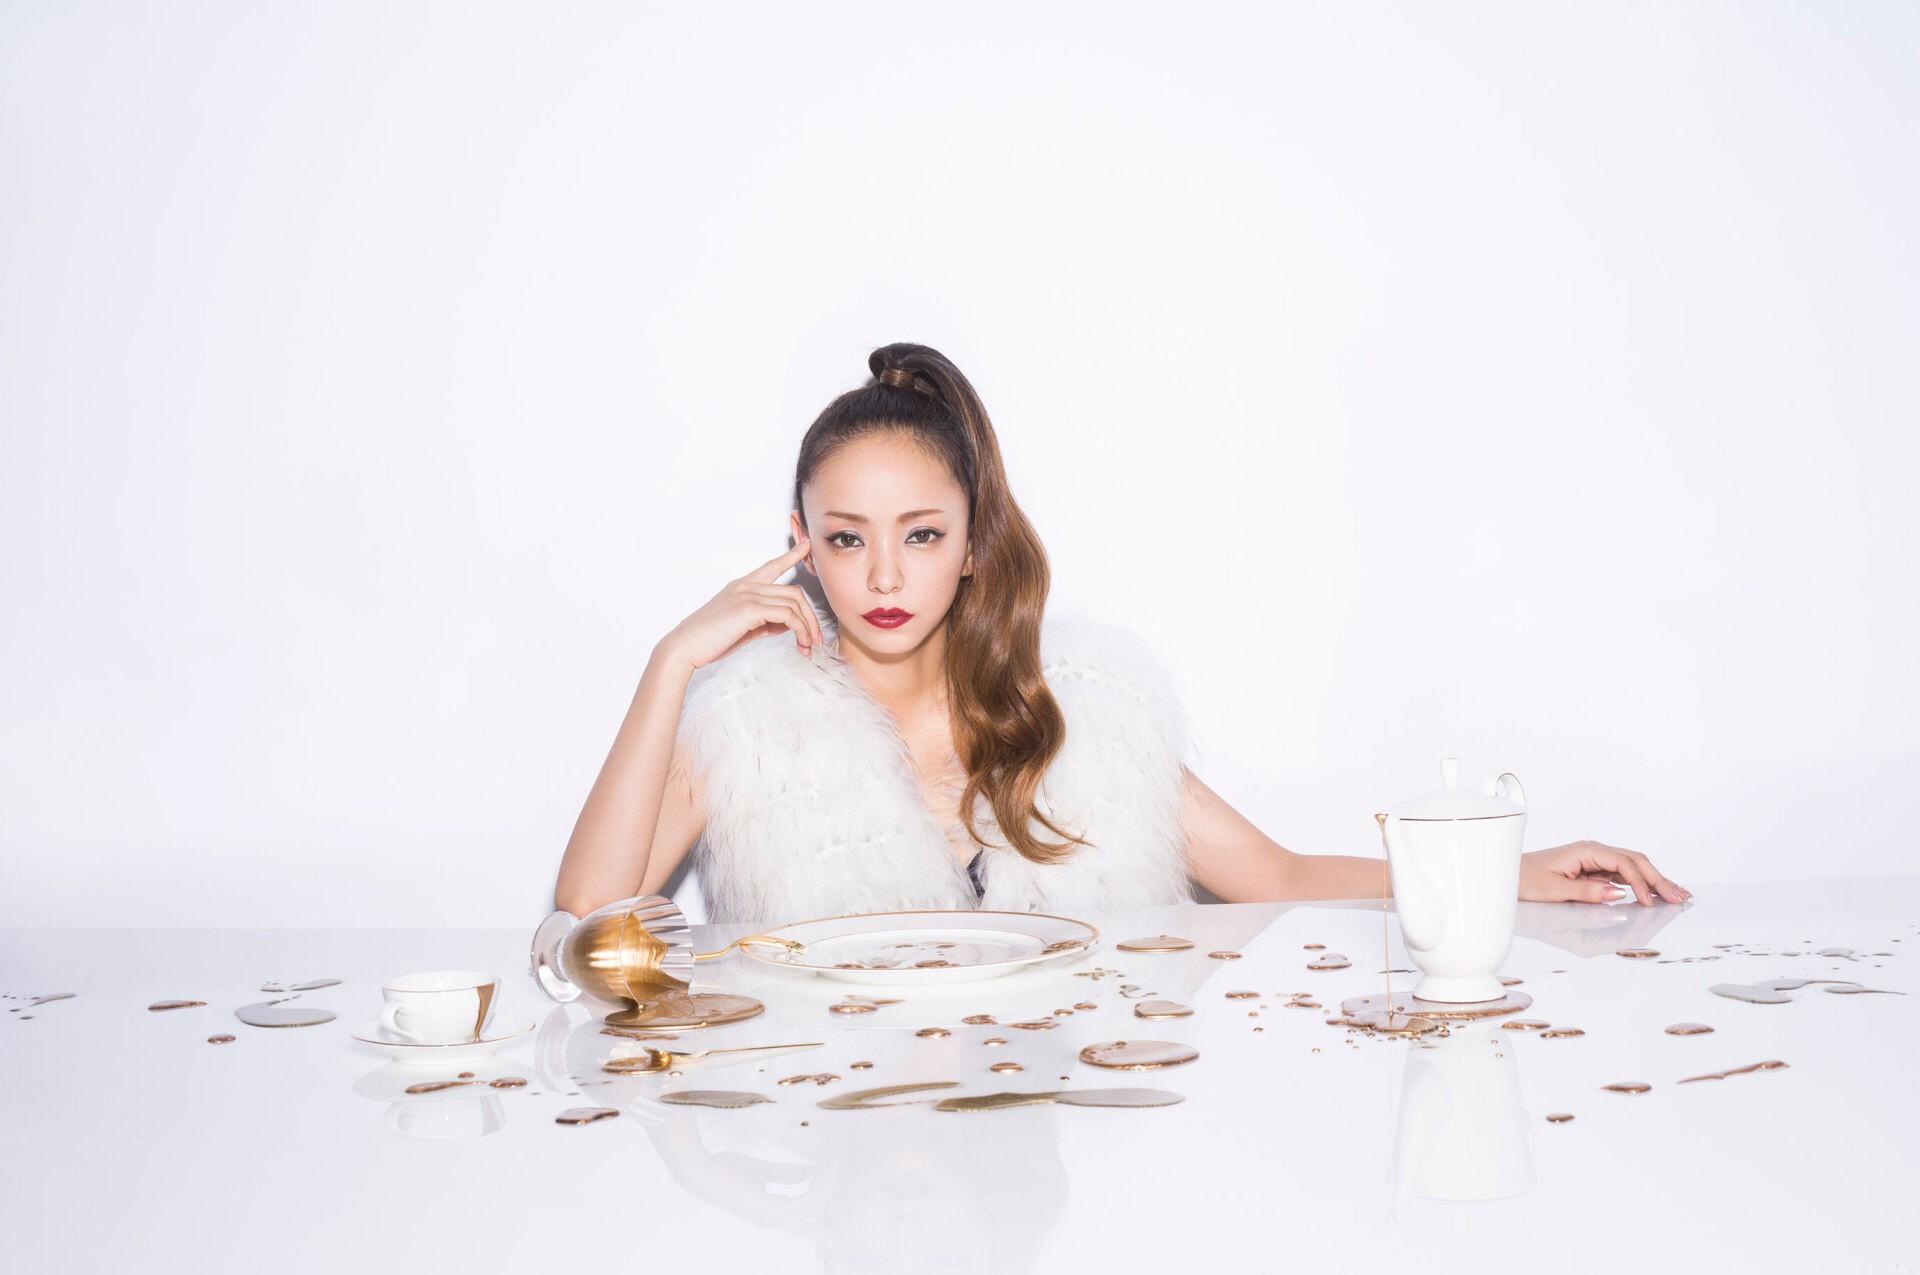 Iflyer 安室奈美恵 Namie Amuro Live Style 2016 2017 の追加公演